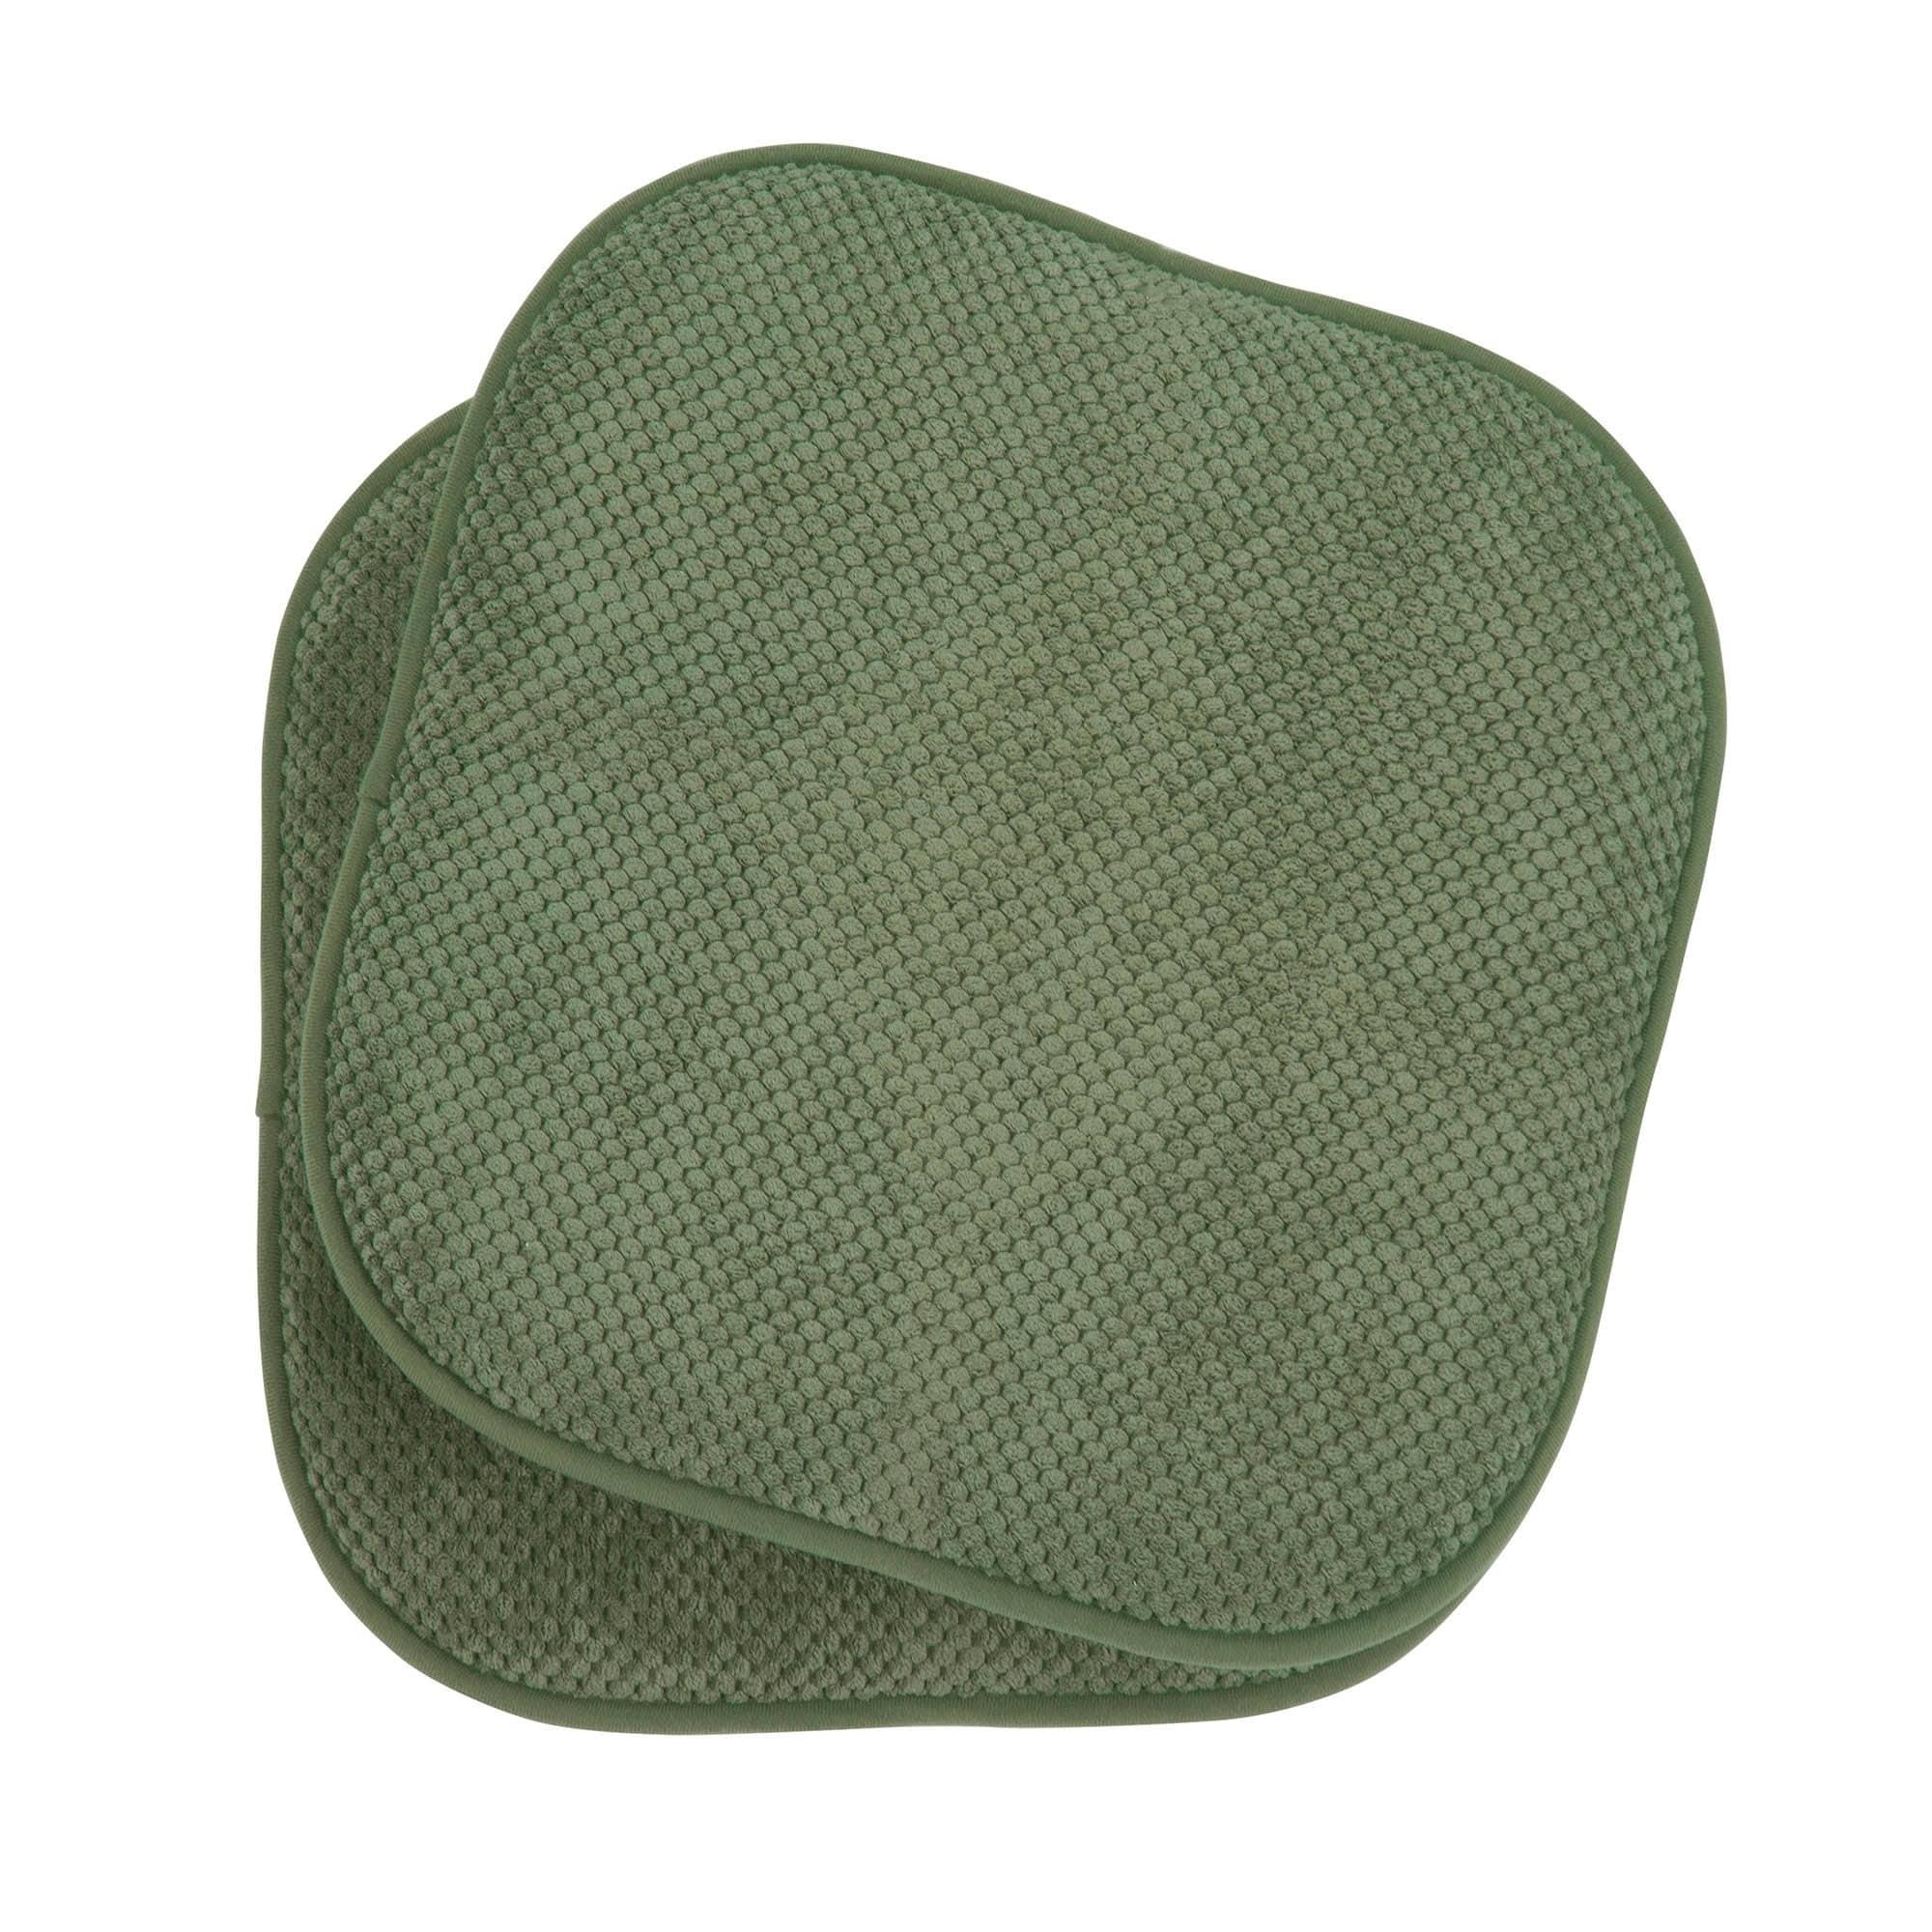 ntw solid black chair cushion seat pad 2 pc set memory foam